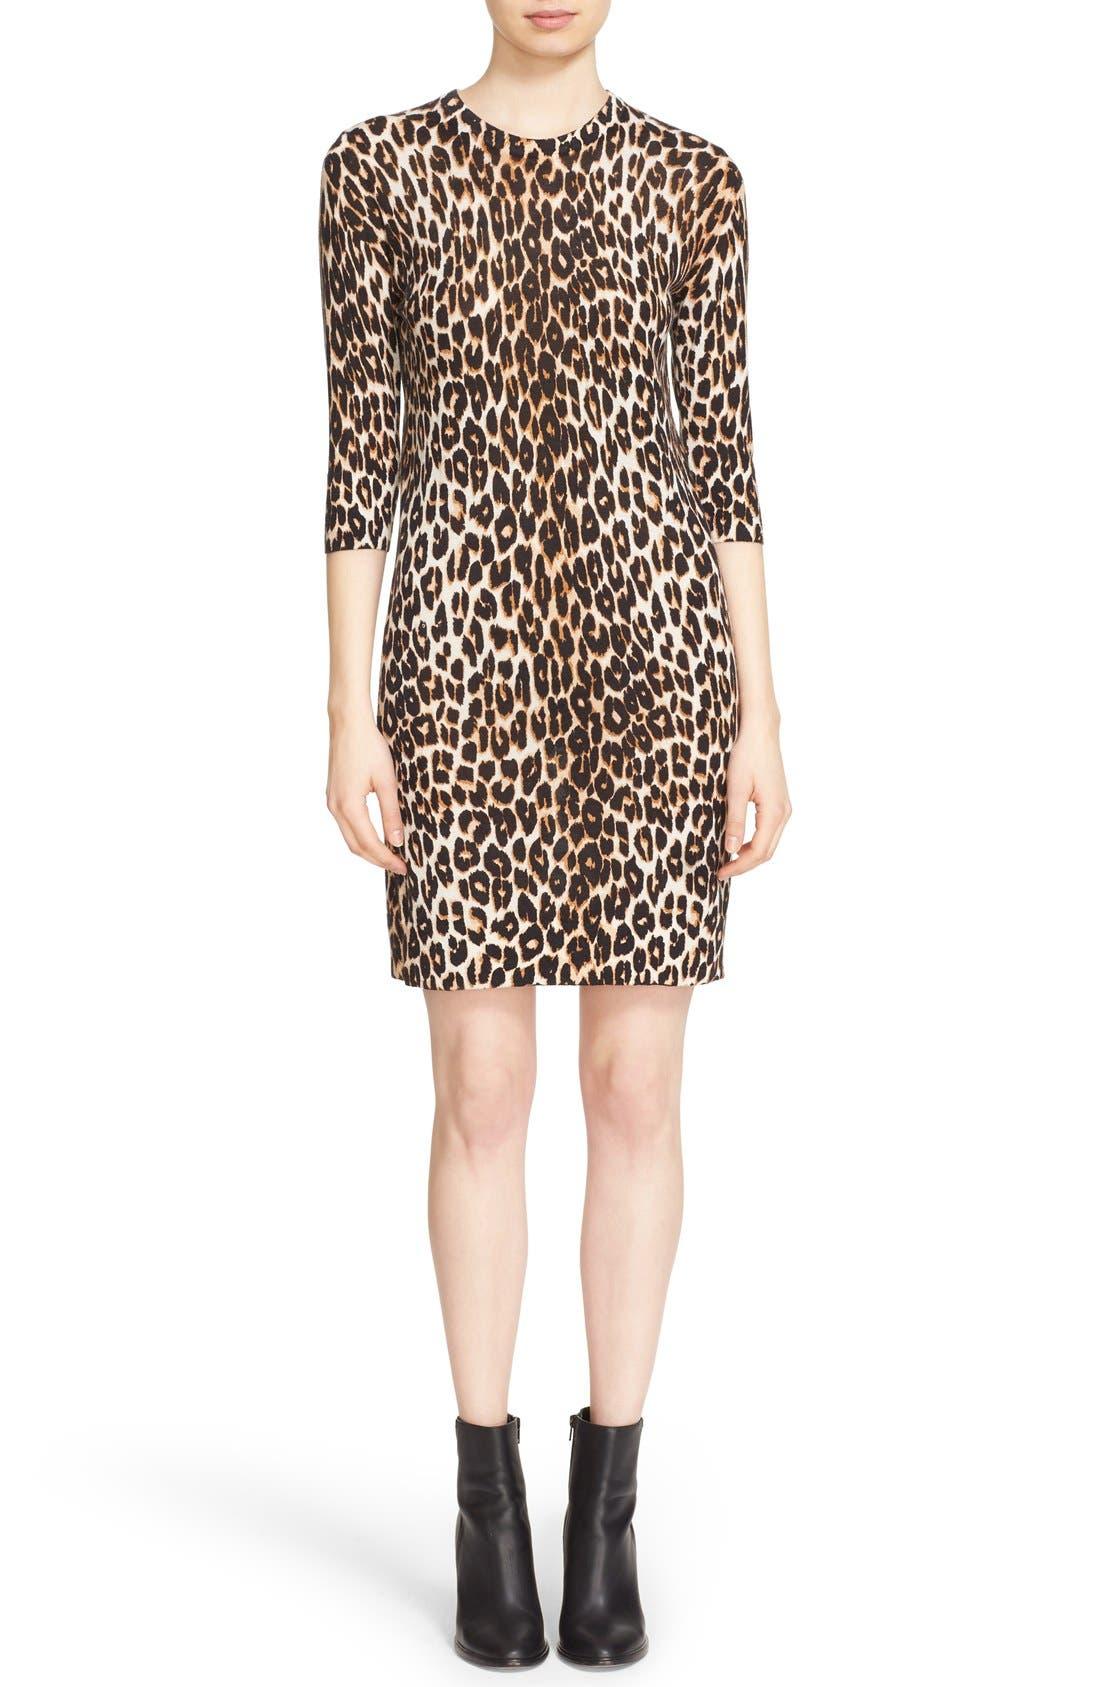 Alternate Image 1 Selected - Equipment 'Marta' Leopard Print Silk & Cashmere Knit Dress